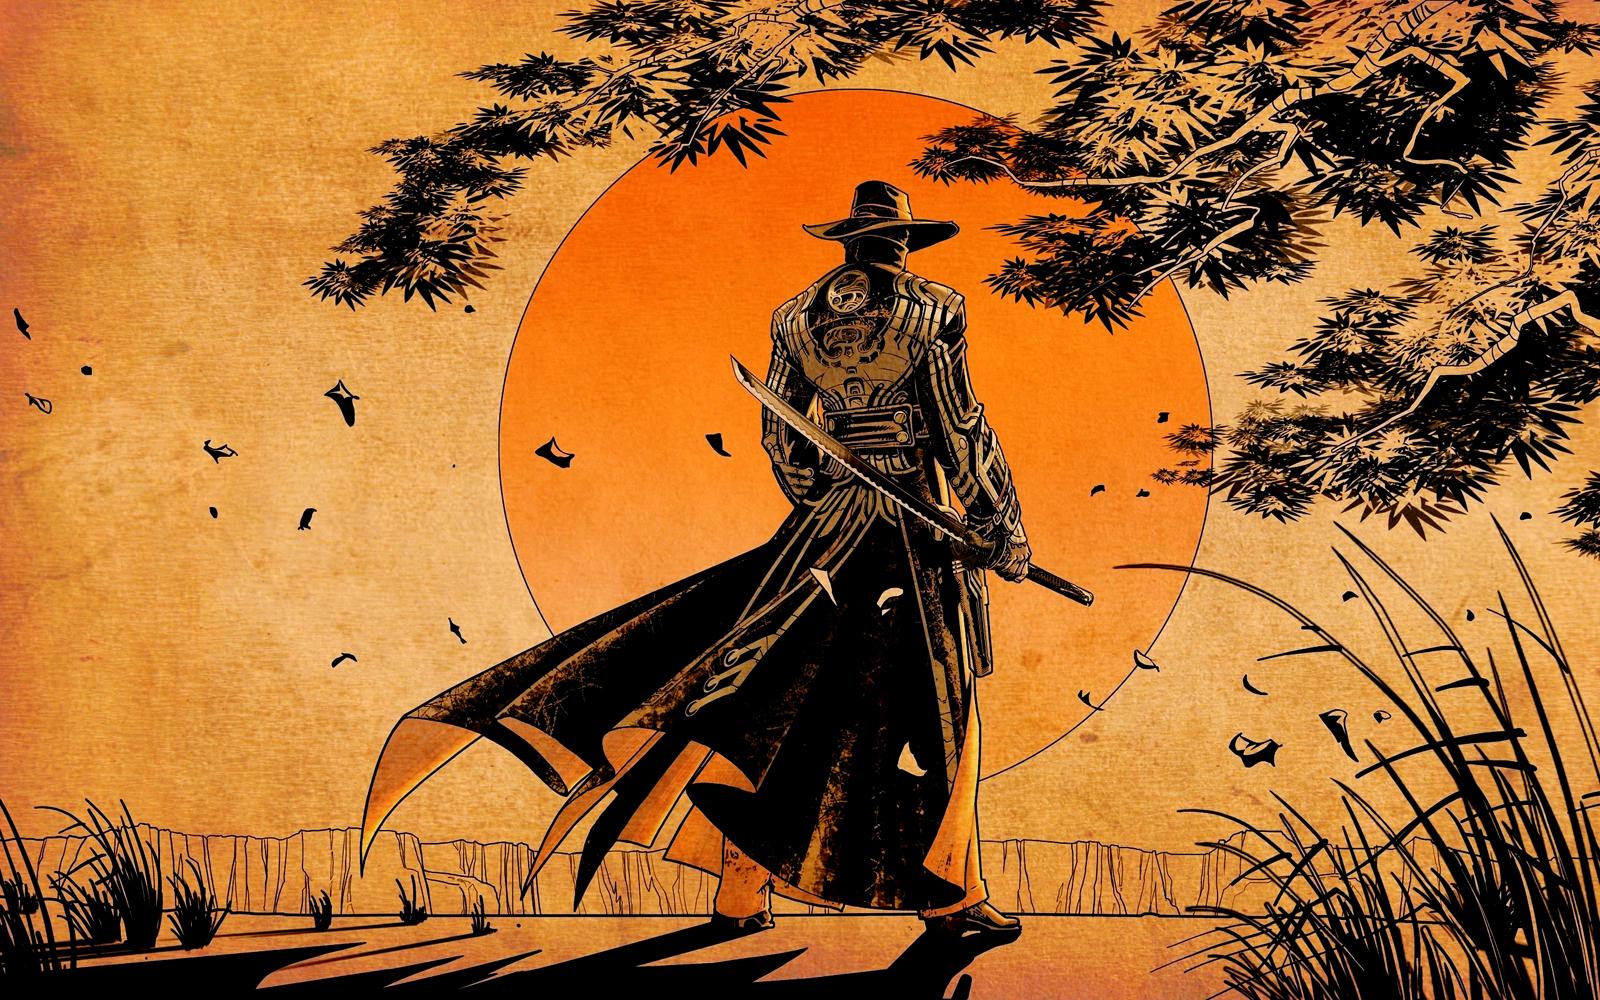 Red Steel 2 Western Samurai Game Wallpapers Desktop Wallpapers 1600x1000